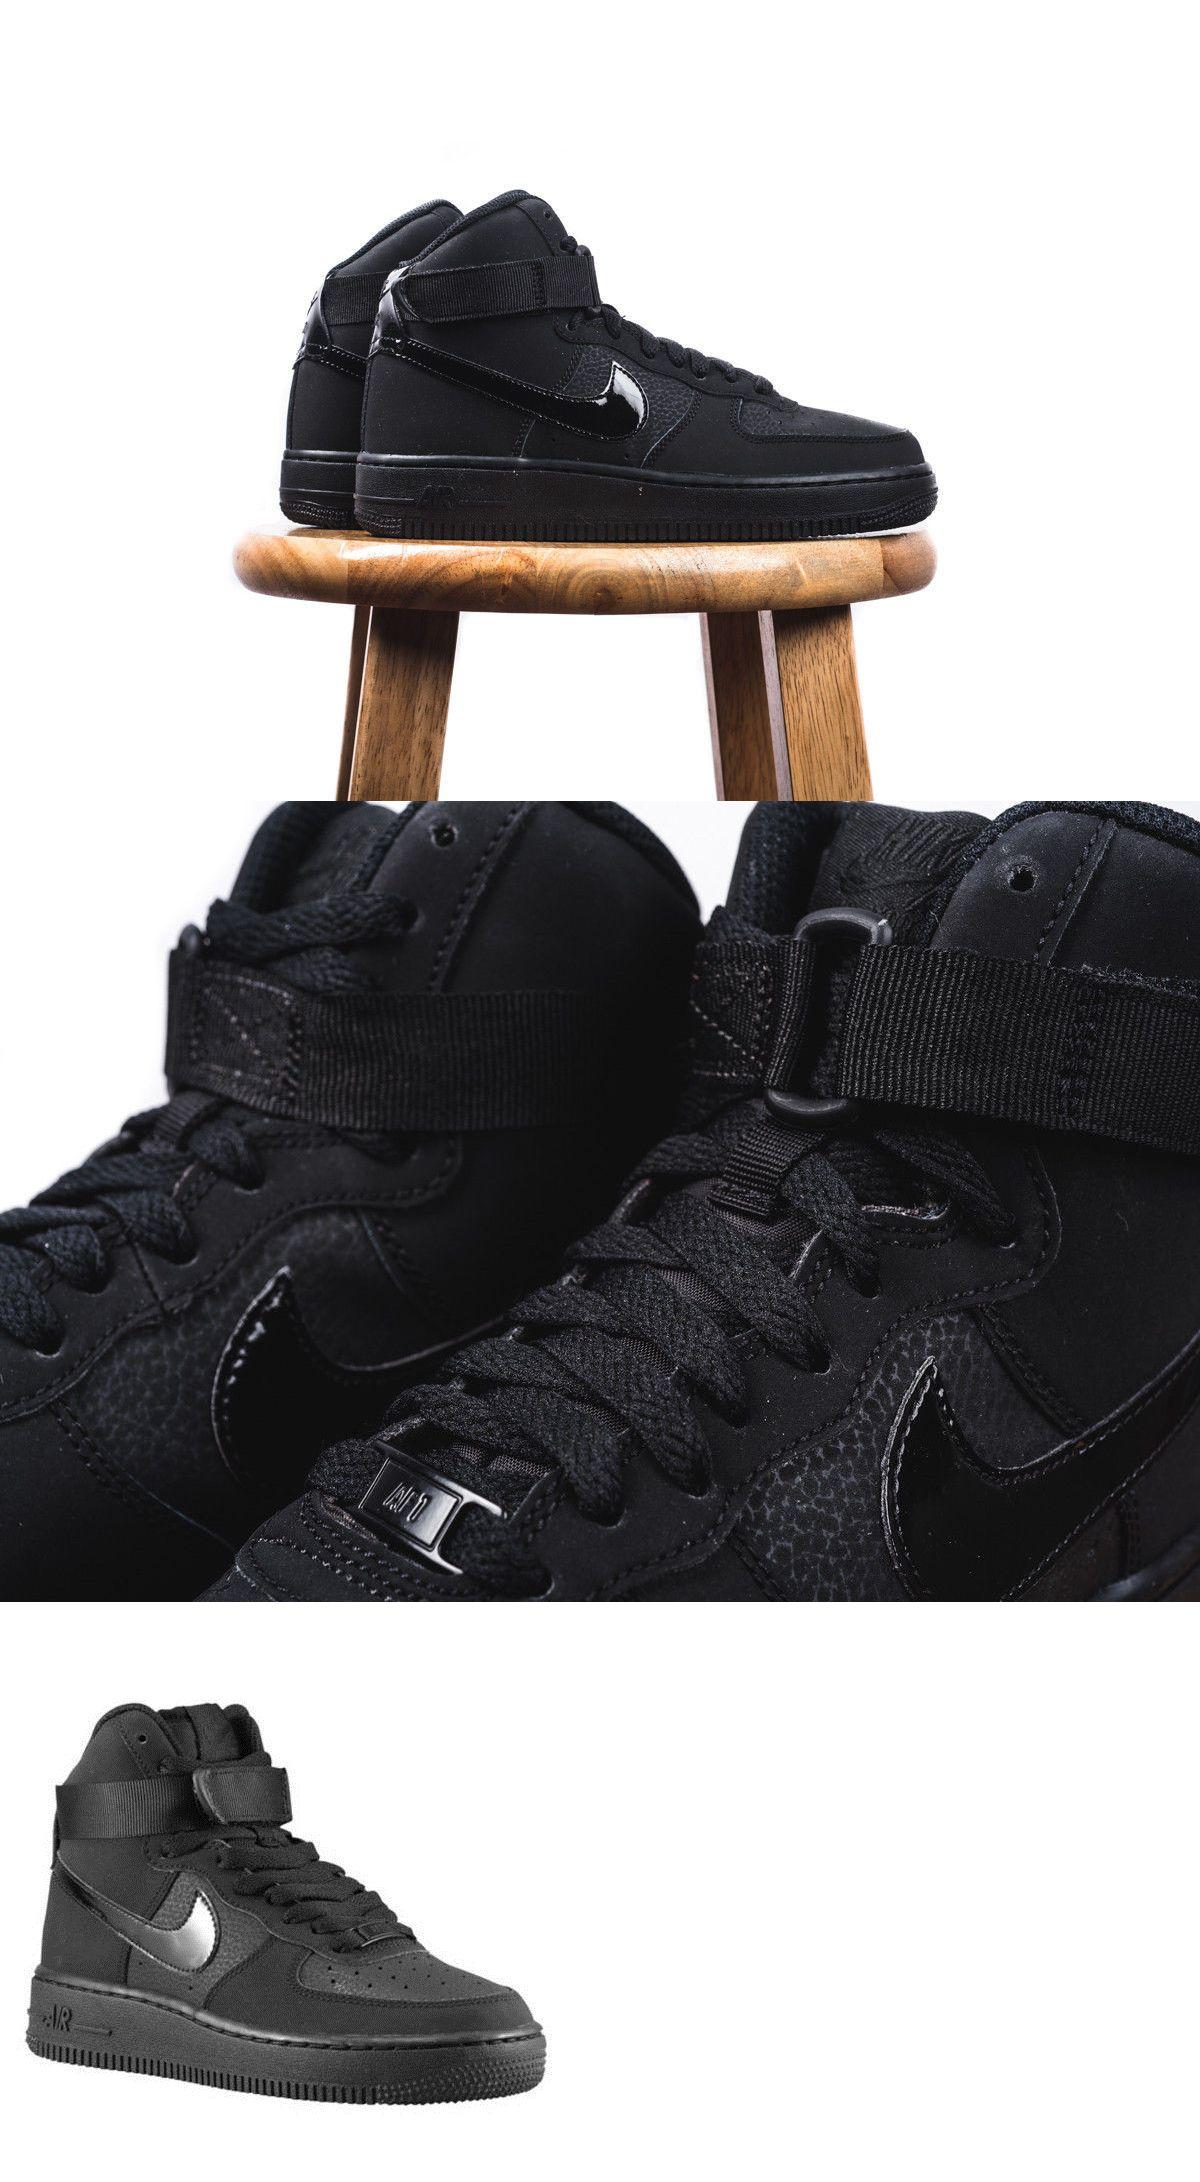 Nib Big Kids Size 5.5 NIKE AIR FORCE 1 Low Top Basketball Shoes White 314192-117